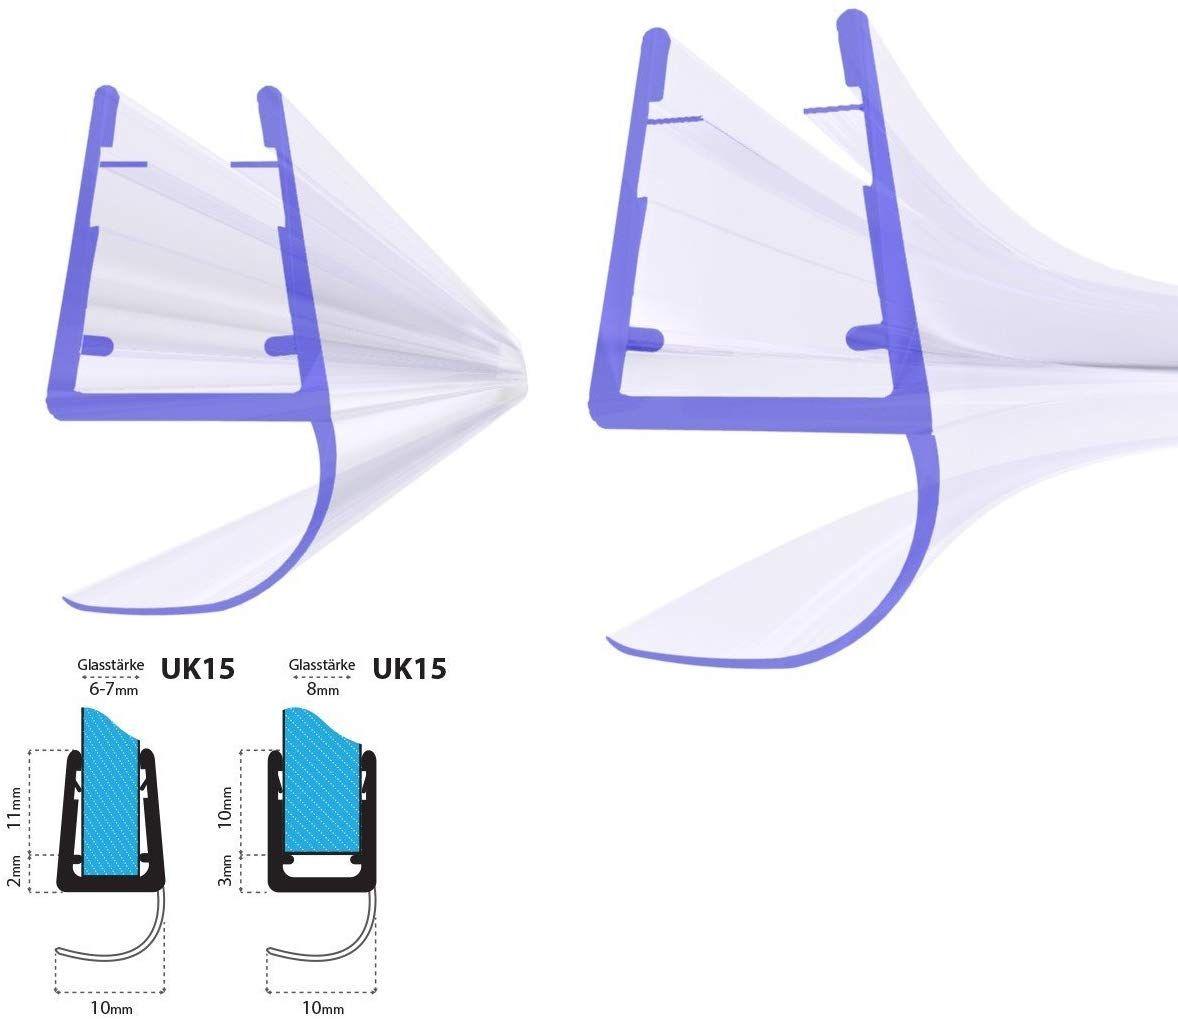 Steigner Frameless Shower Door Bottom Seal Uk15 For 0 195 Inch To 0 312 Inch 5mm To 8mm Glass Thickness Frameless Shower Shower Doors Frameless Shower Doors